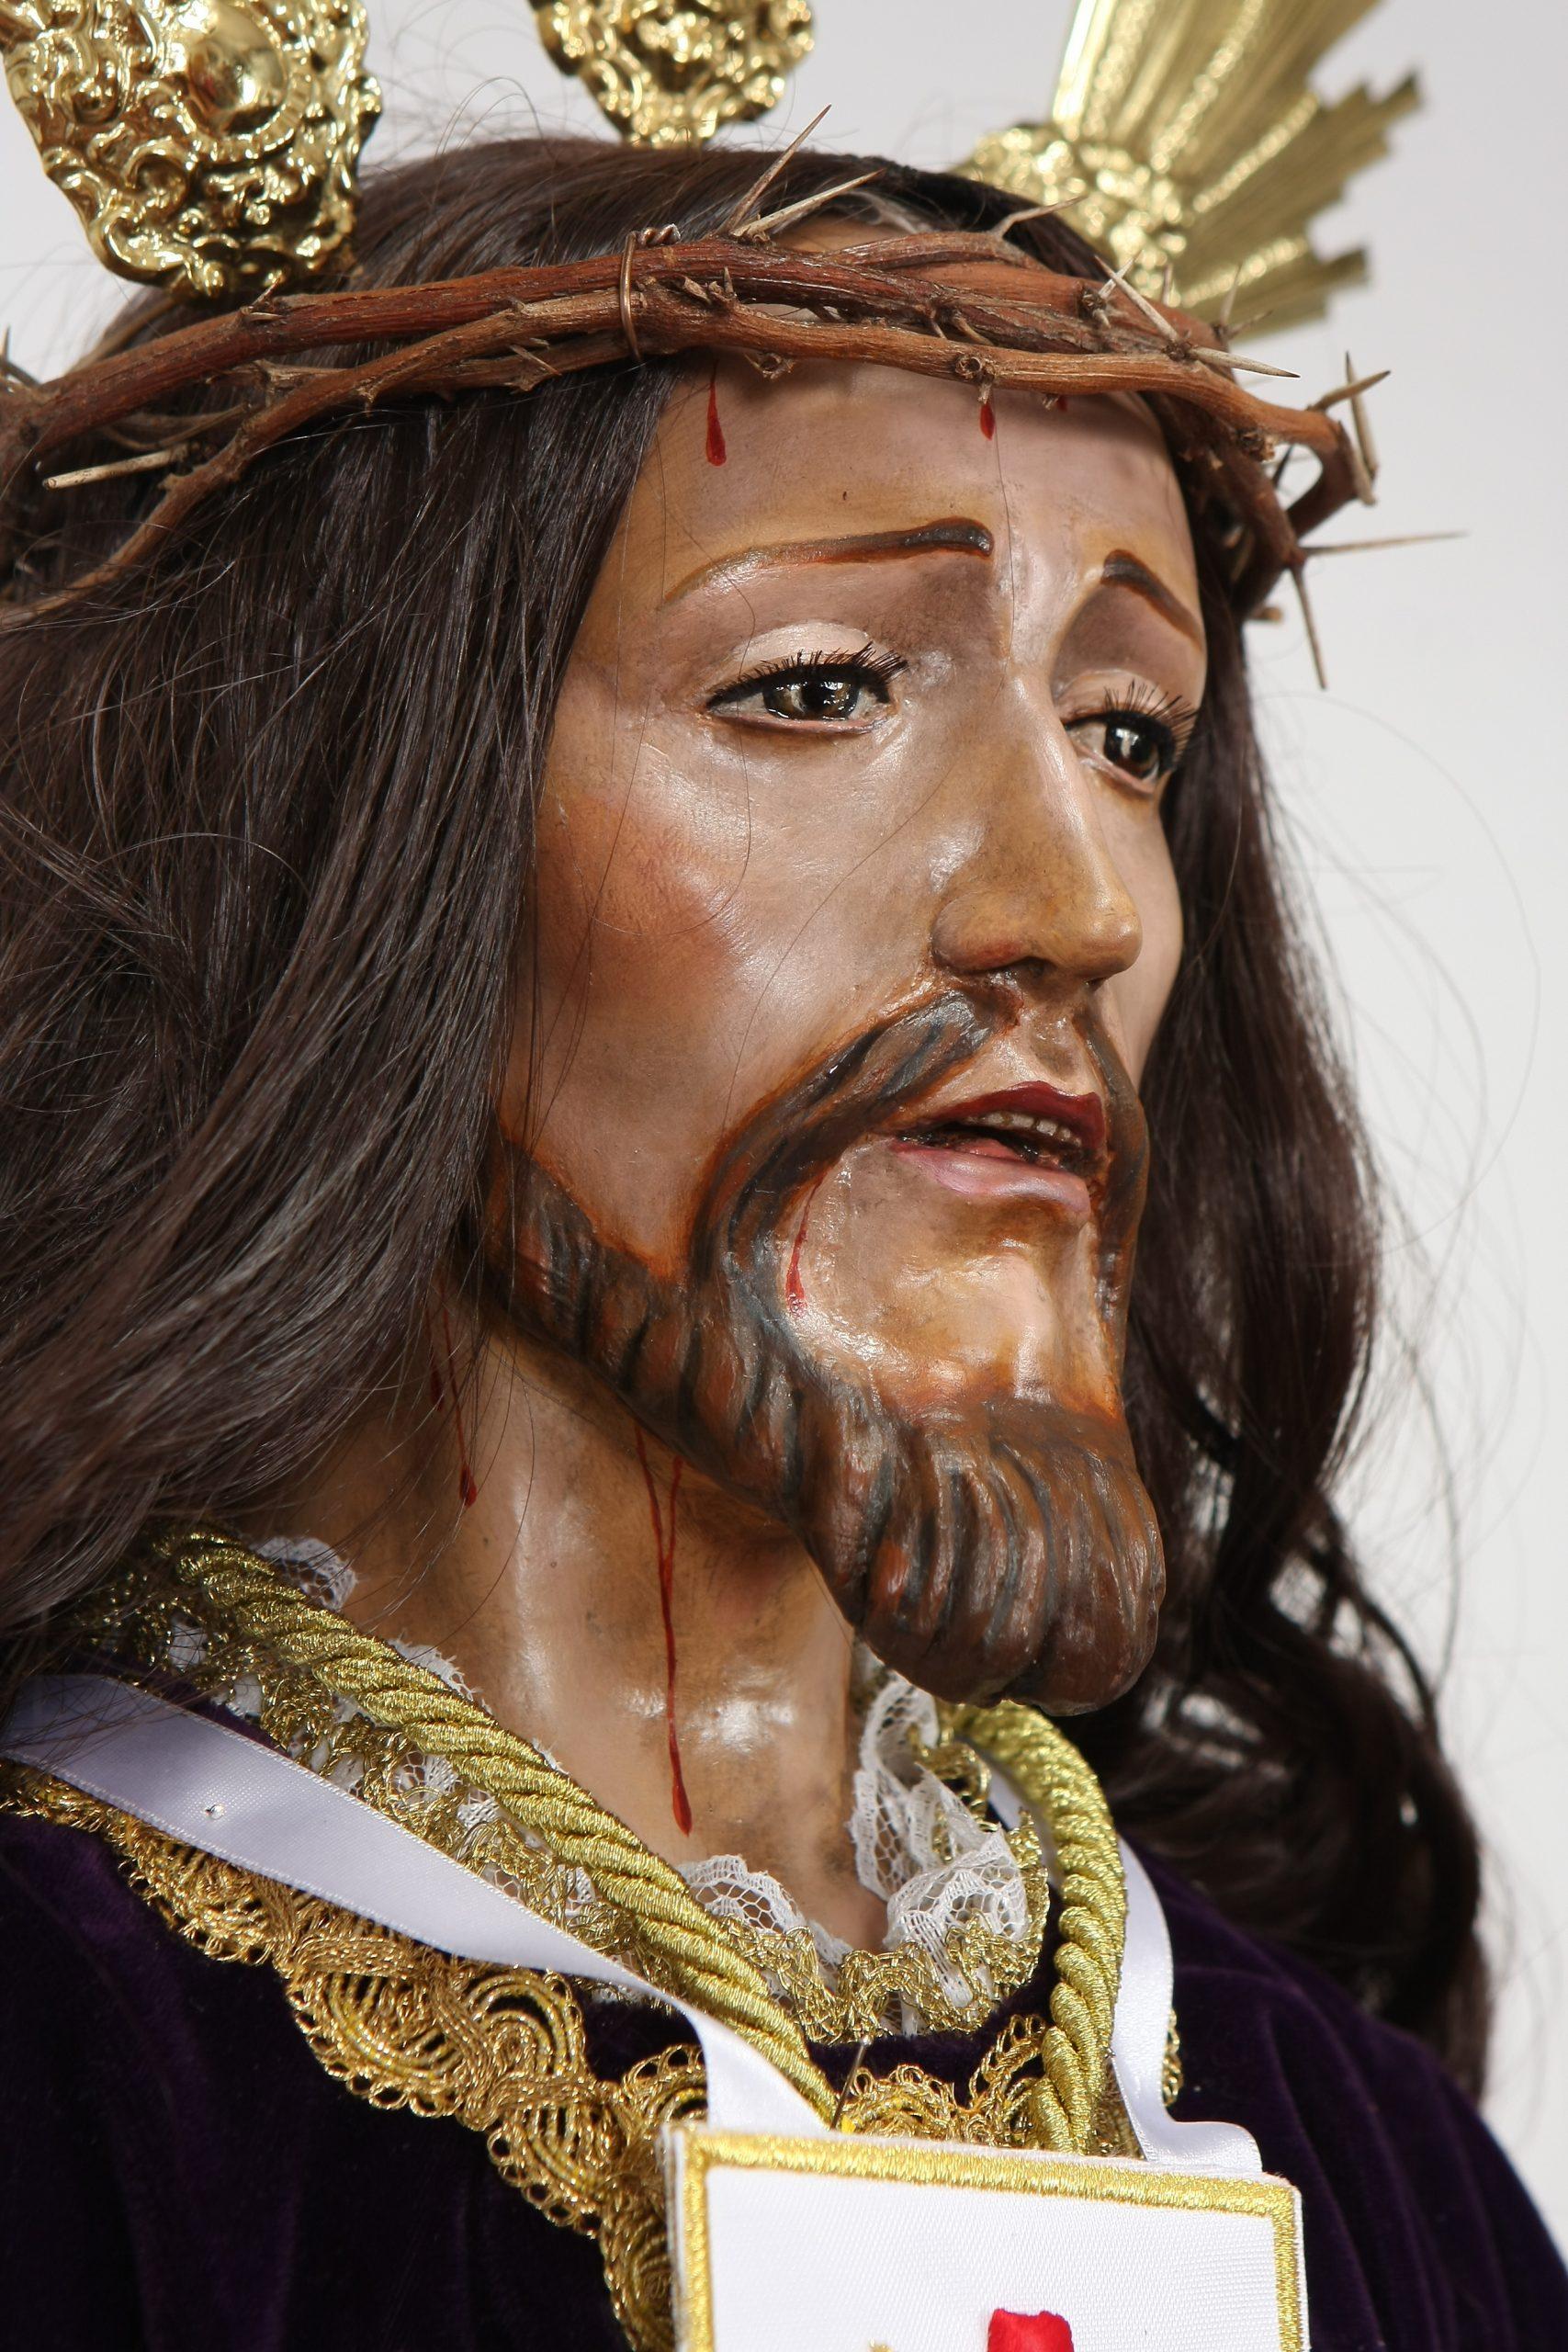 Jesus Cautivo de Medinaceli